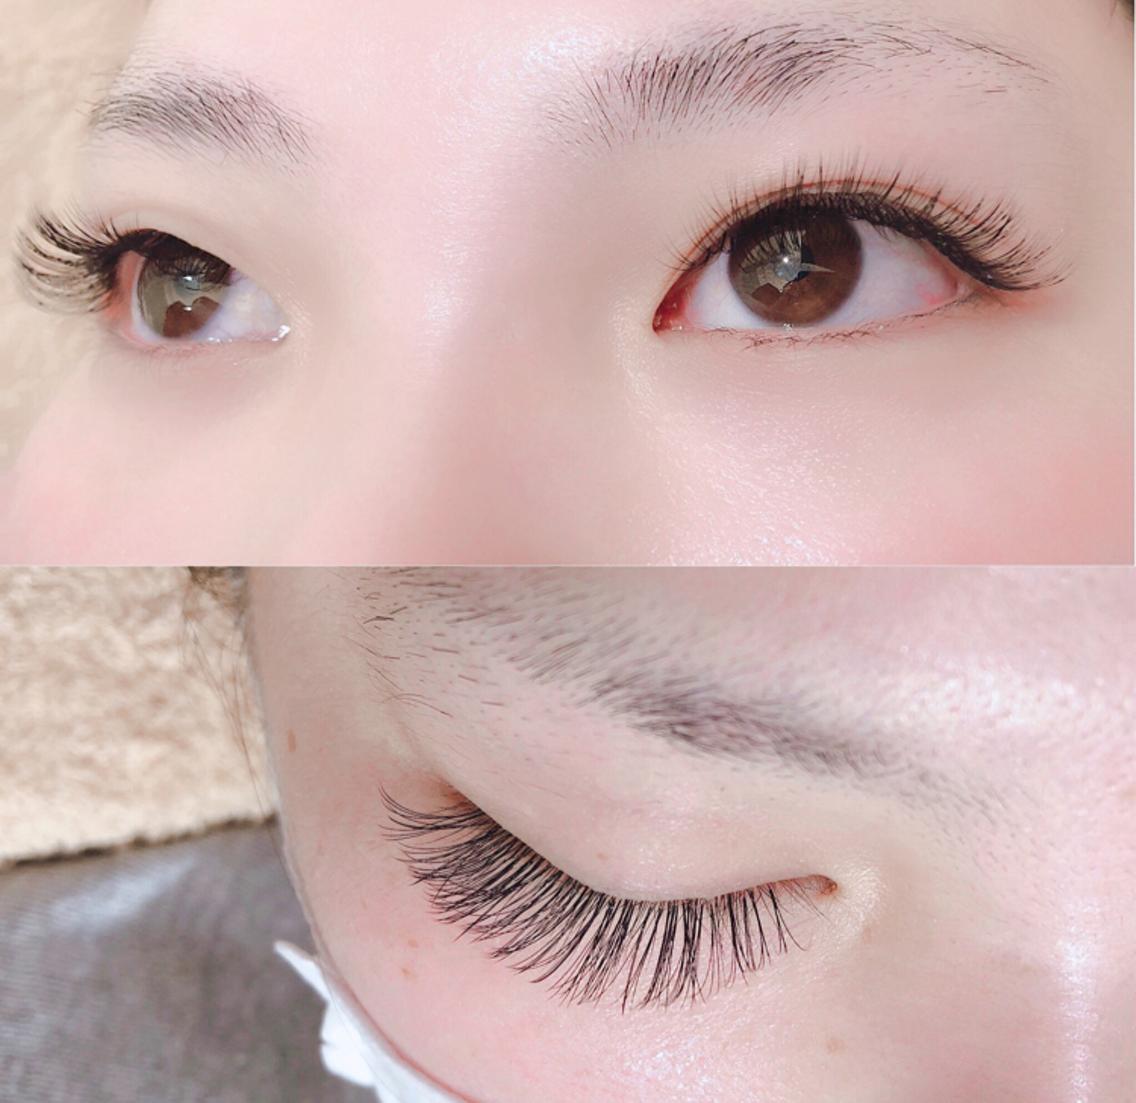 Eye Lash Salon Vivi【ヴィヴィ】所属・ゴトウナミの掲載